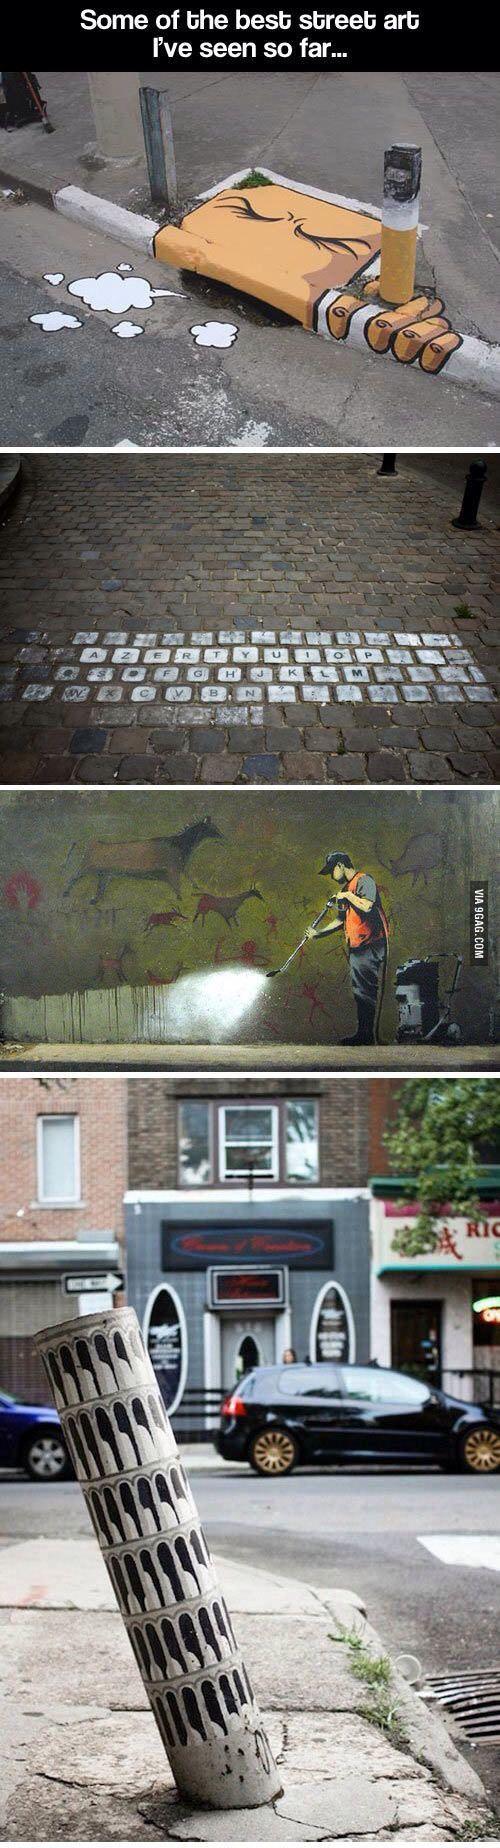 Some of the best Urban Street Art I've seen